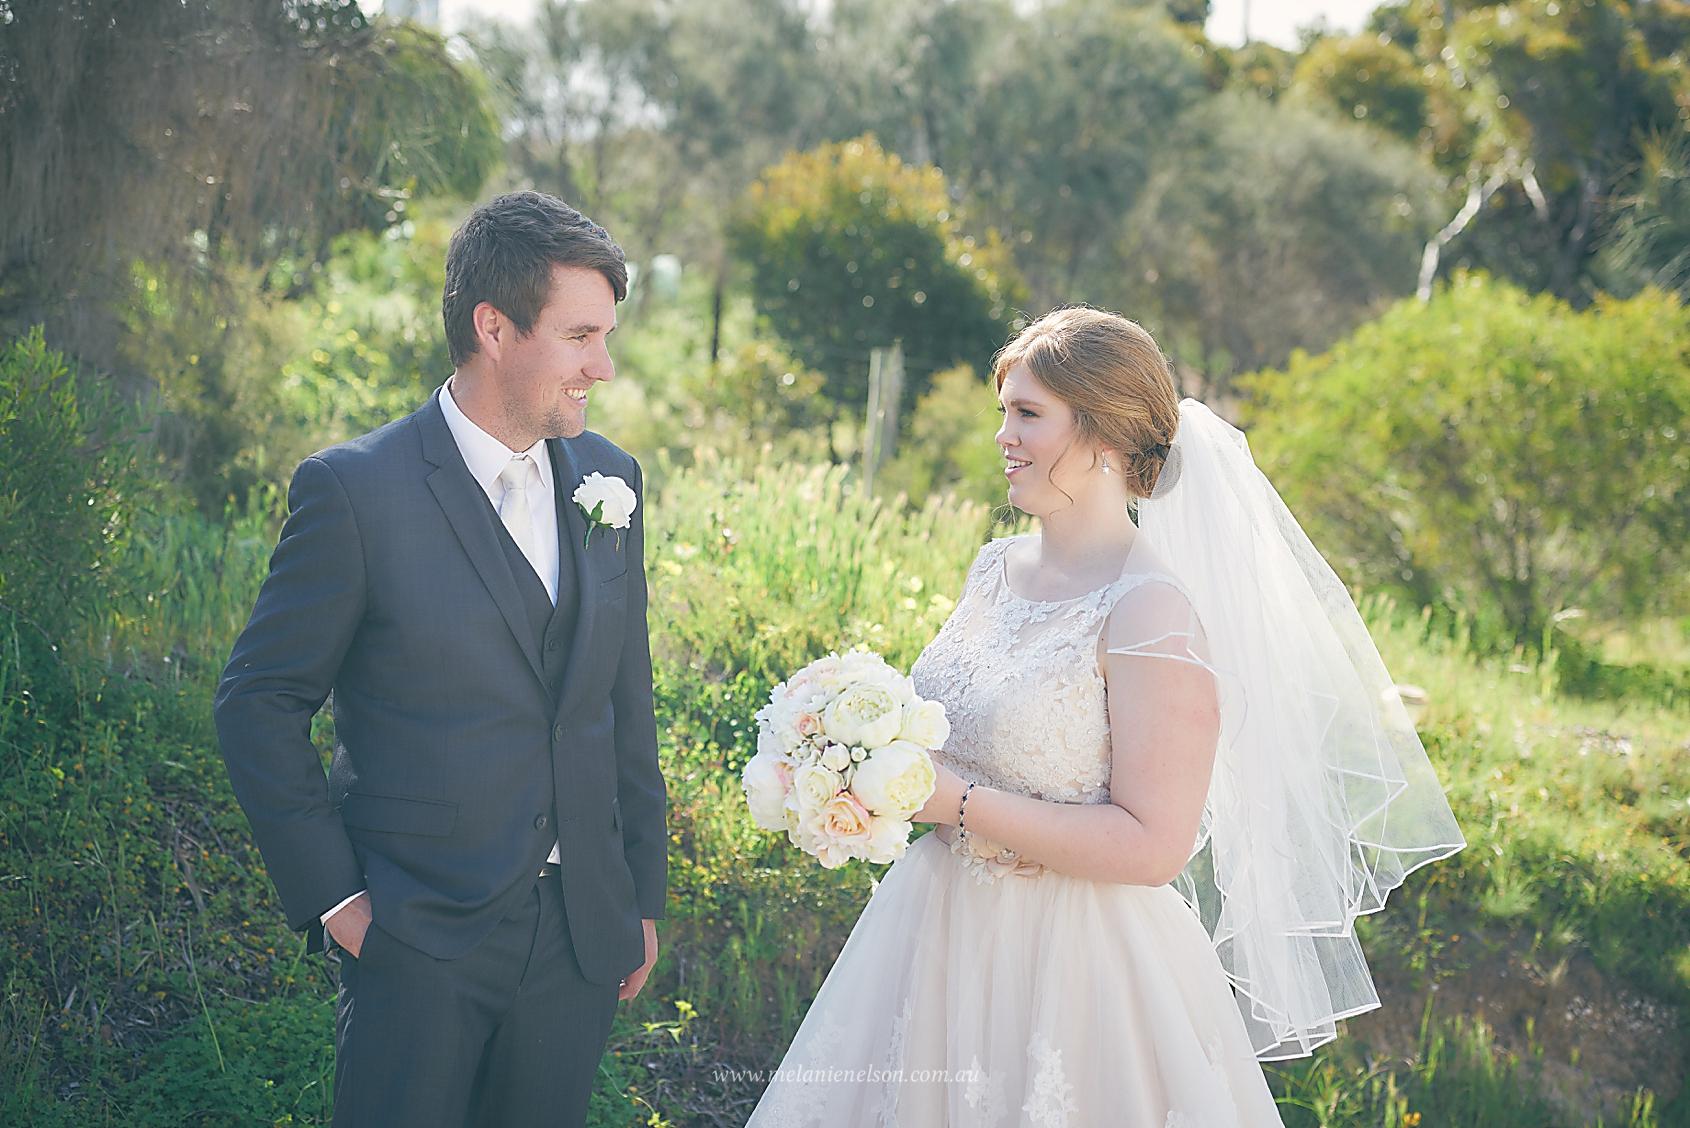 yorke_peninsula_wedding_photographer_0049.jpg